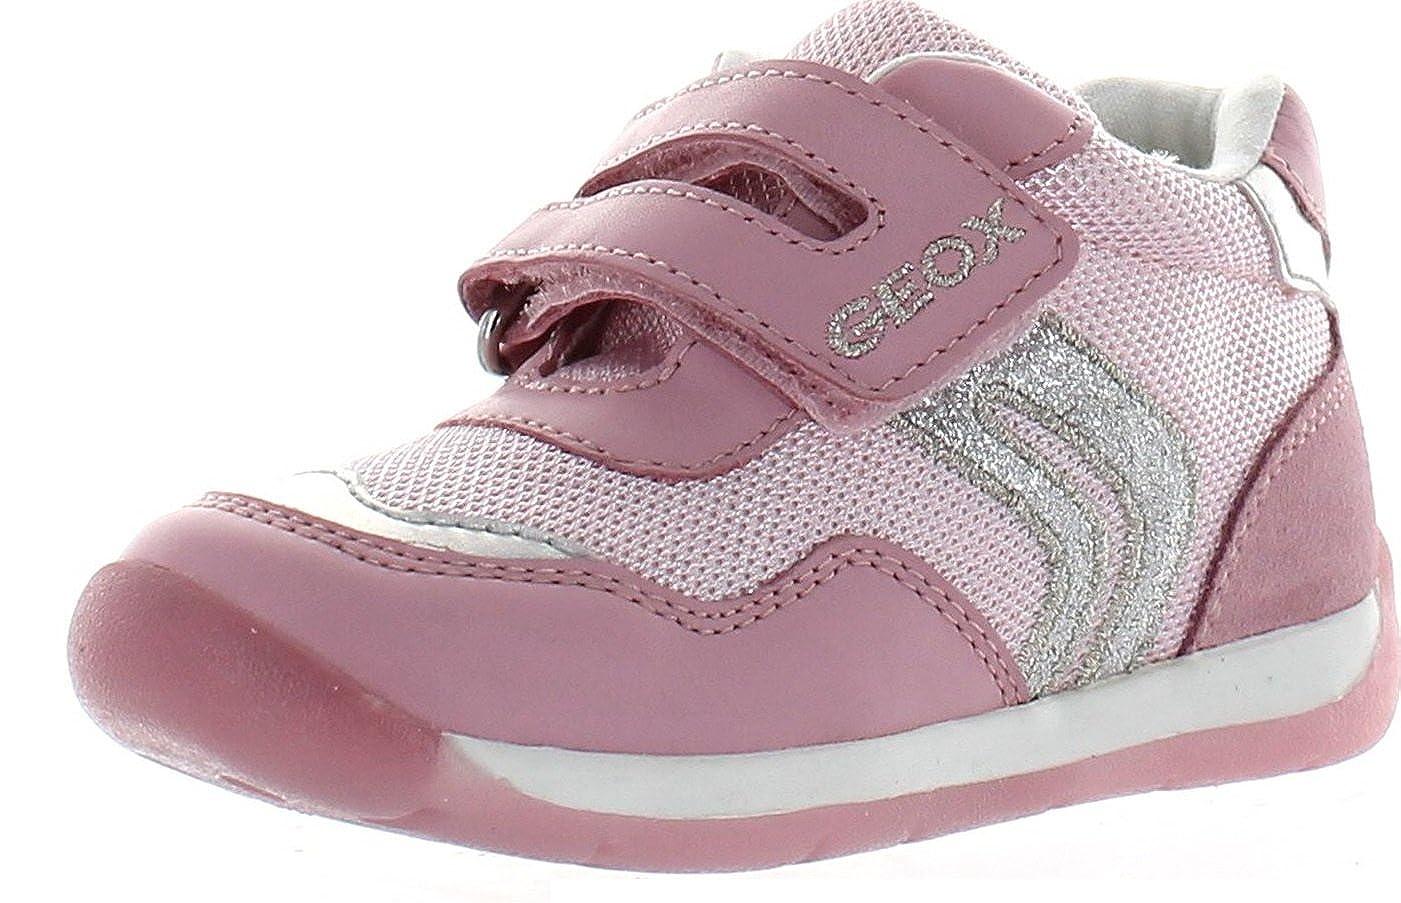 Geox Girls Baby Each Girl Fashion Sneaker